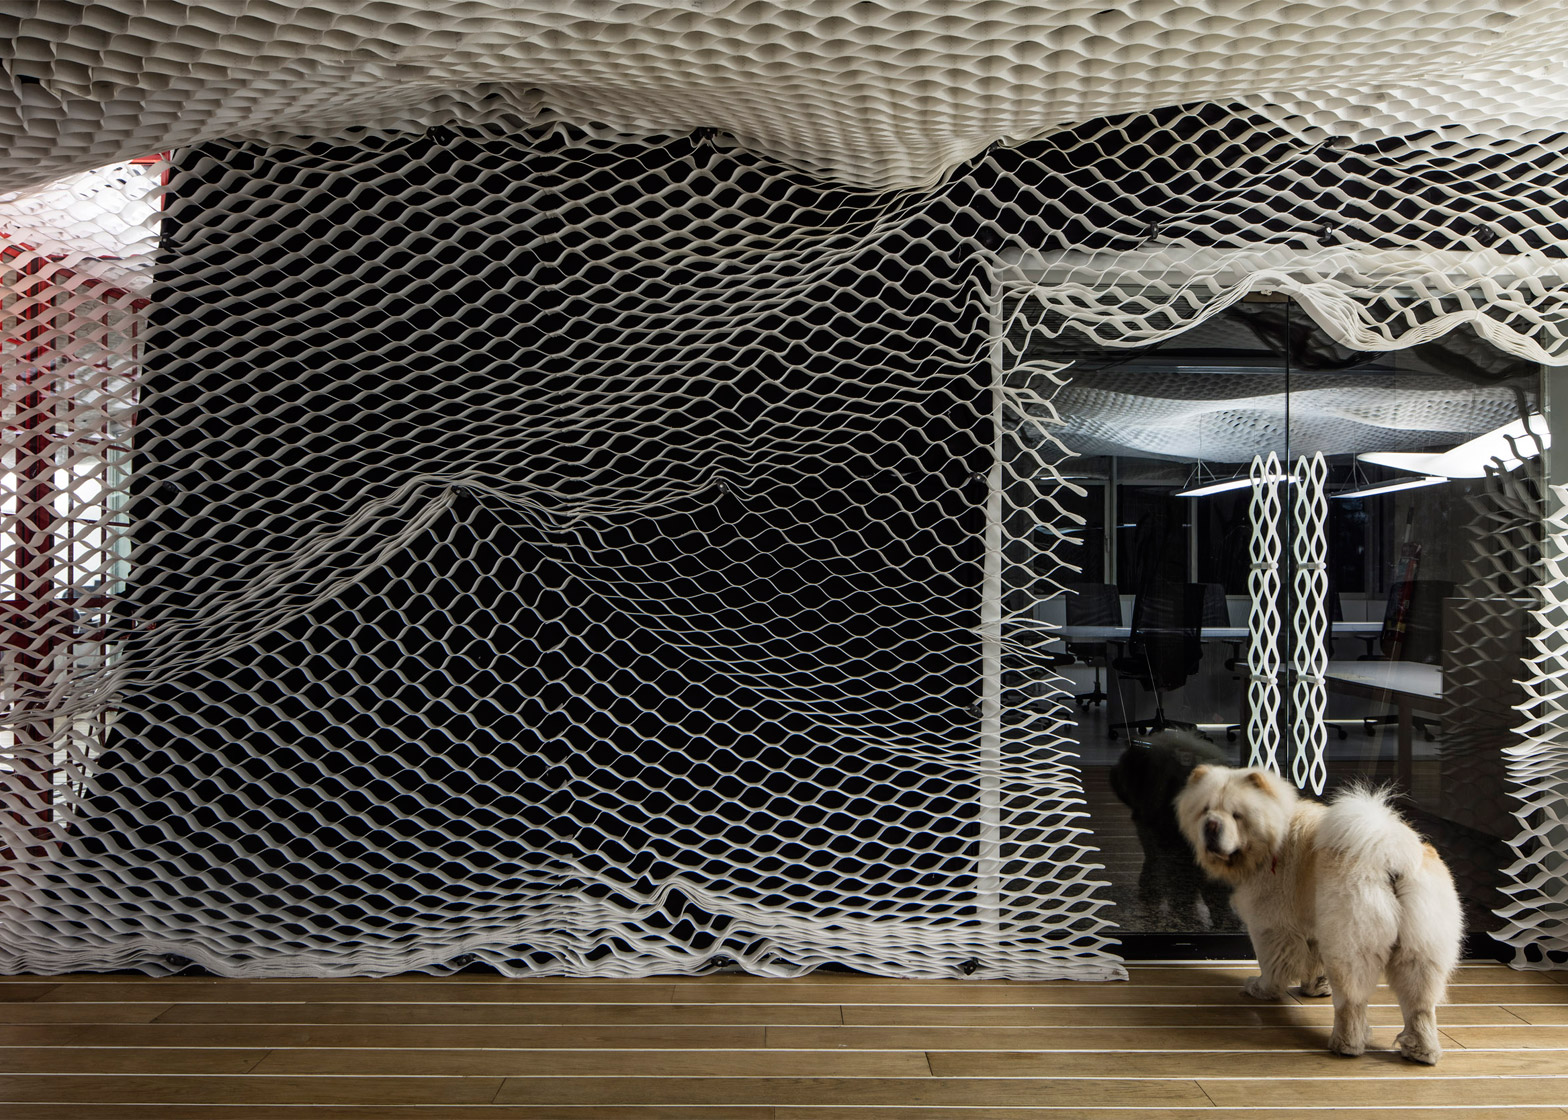 prs-offices-paritzki-liani-architects-interiors-ceiling-geo-cell-tel-aviv-israel-colour_dezeen_1568_4